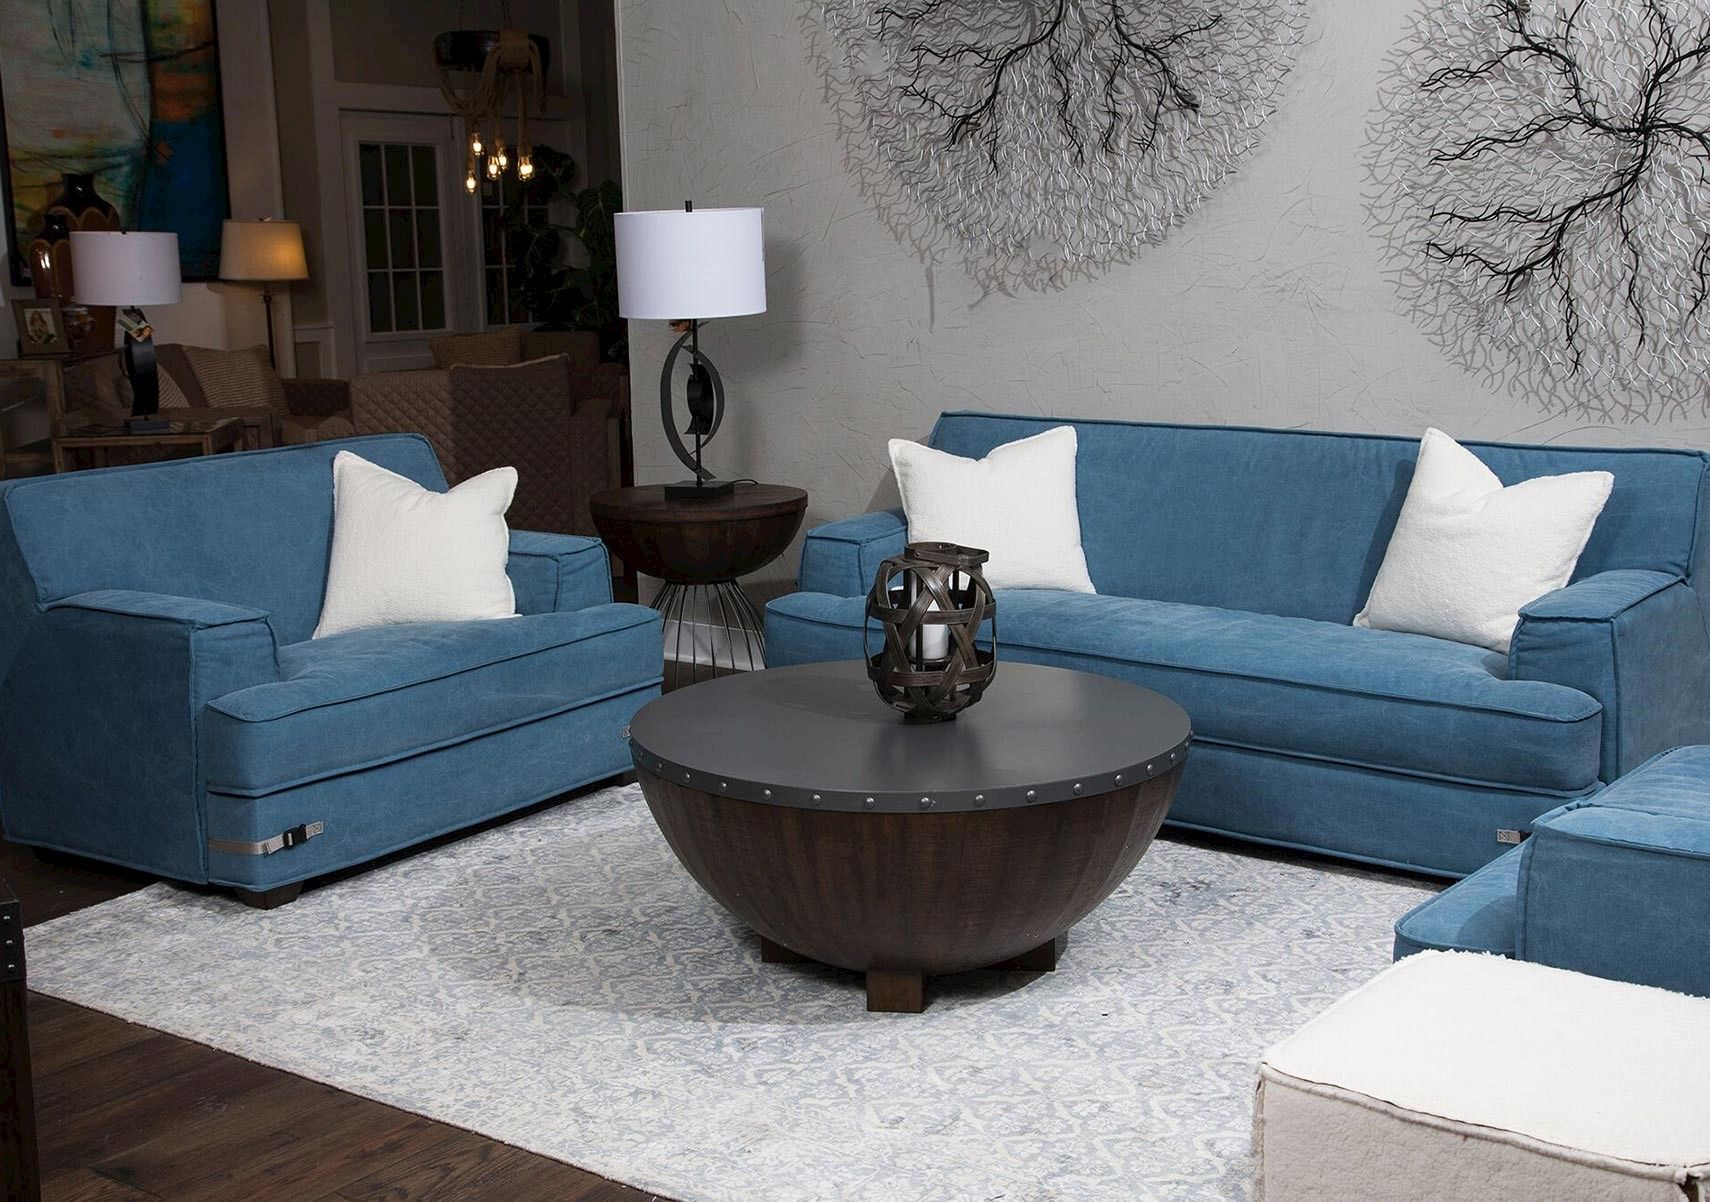 Lacks Penninsula 2 Pc Living Room Set Living Room Sets Room Set Contemporary Style Homes #pc #for #living #room